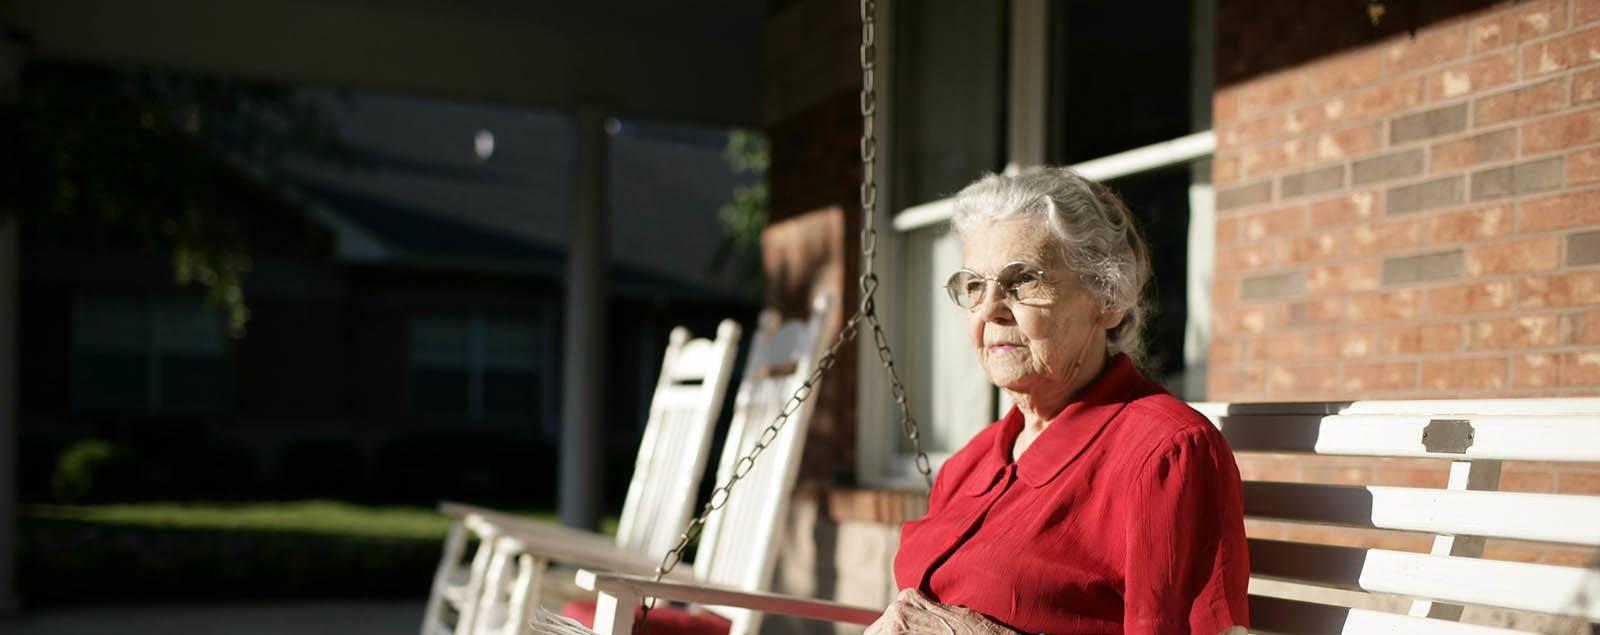 Memory Care at Rock Hill senior living